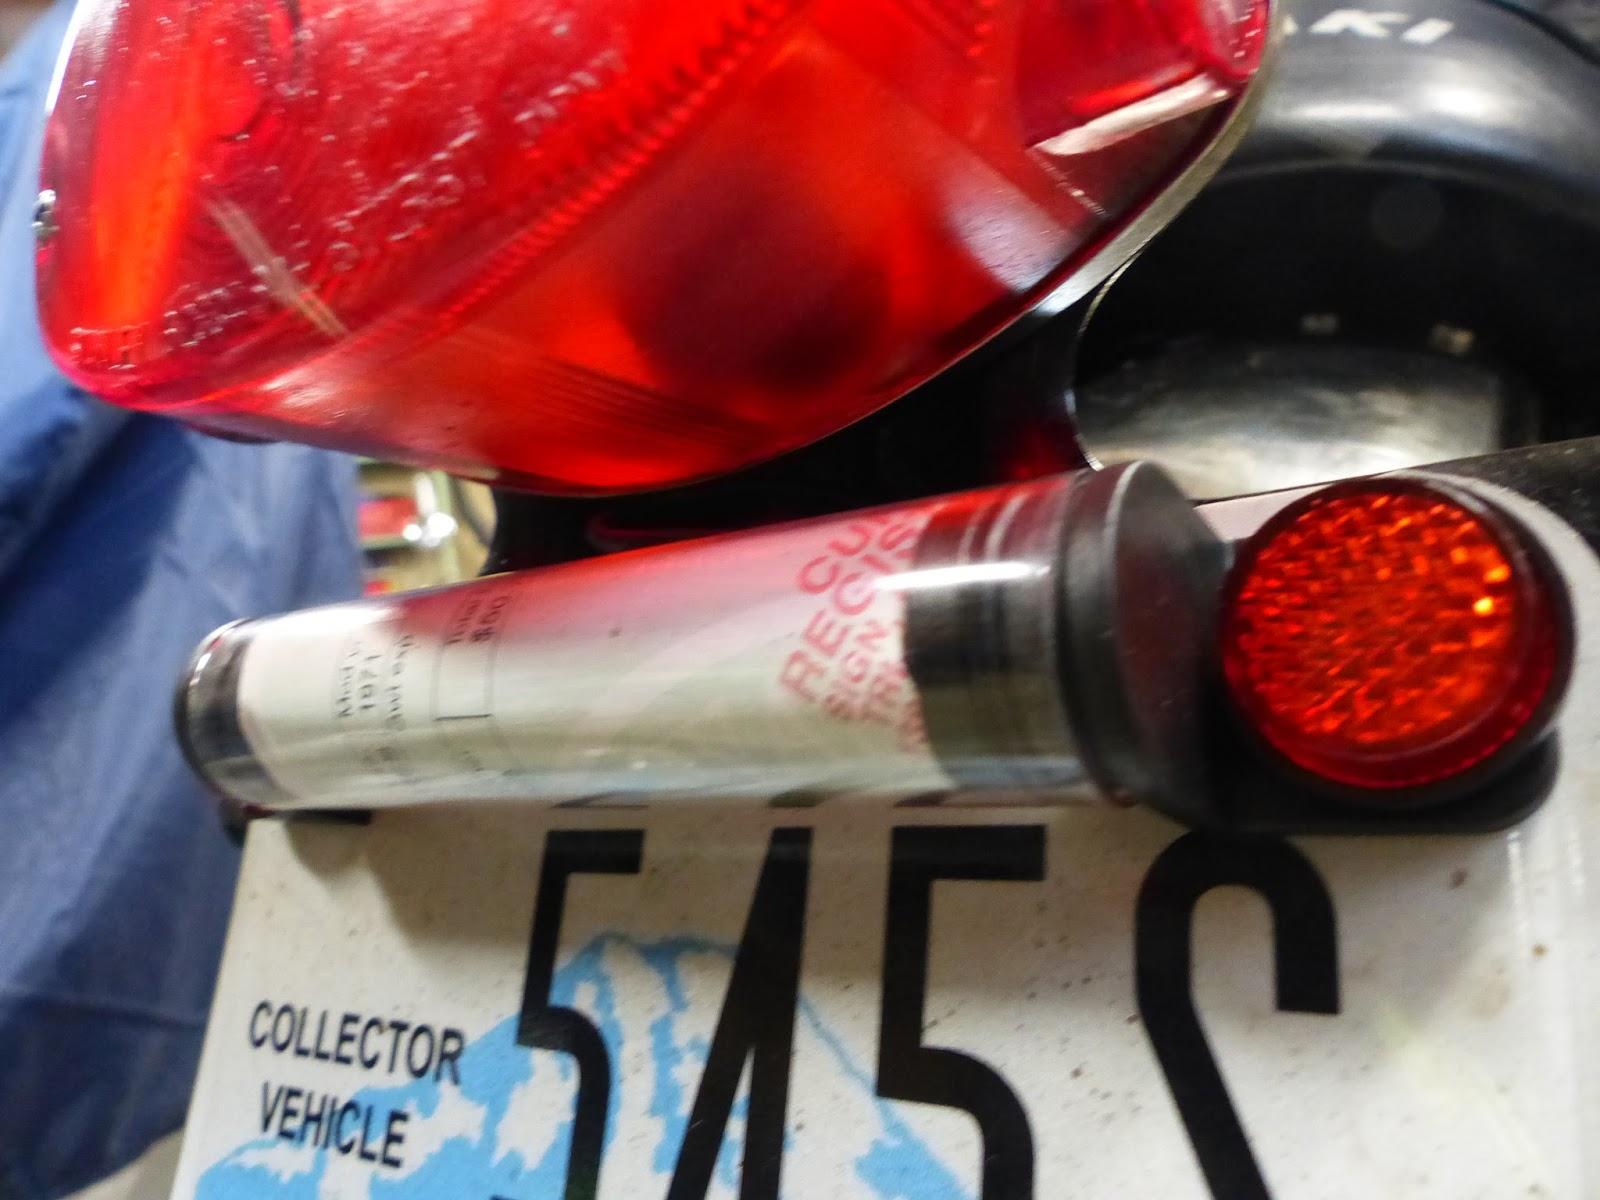 OldMotoDude: Motorcycle Registration Holder